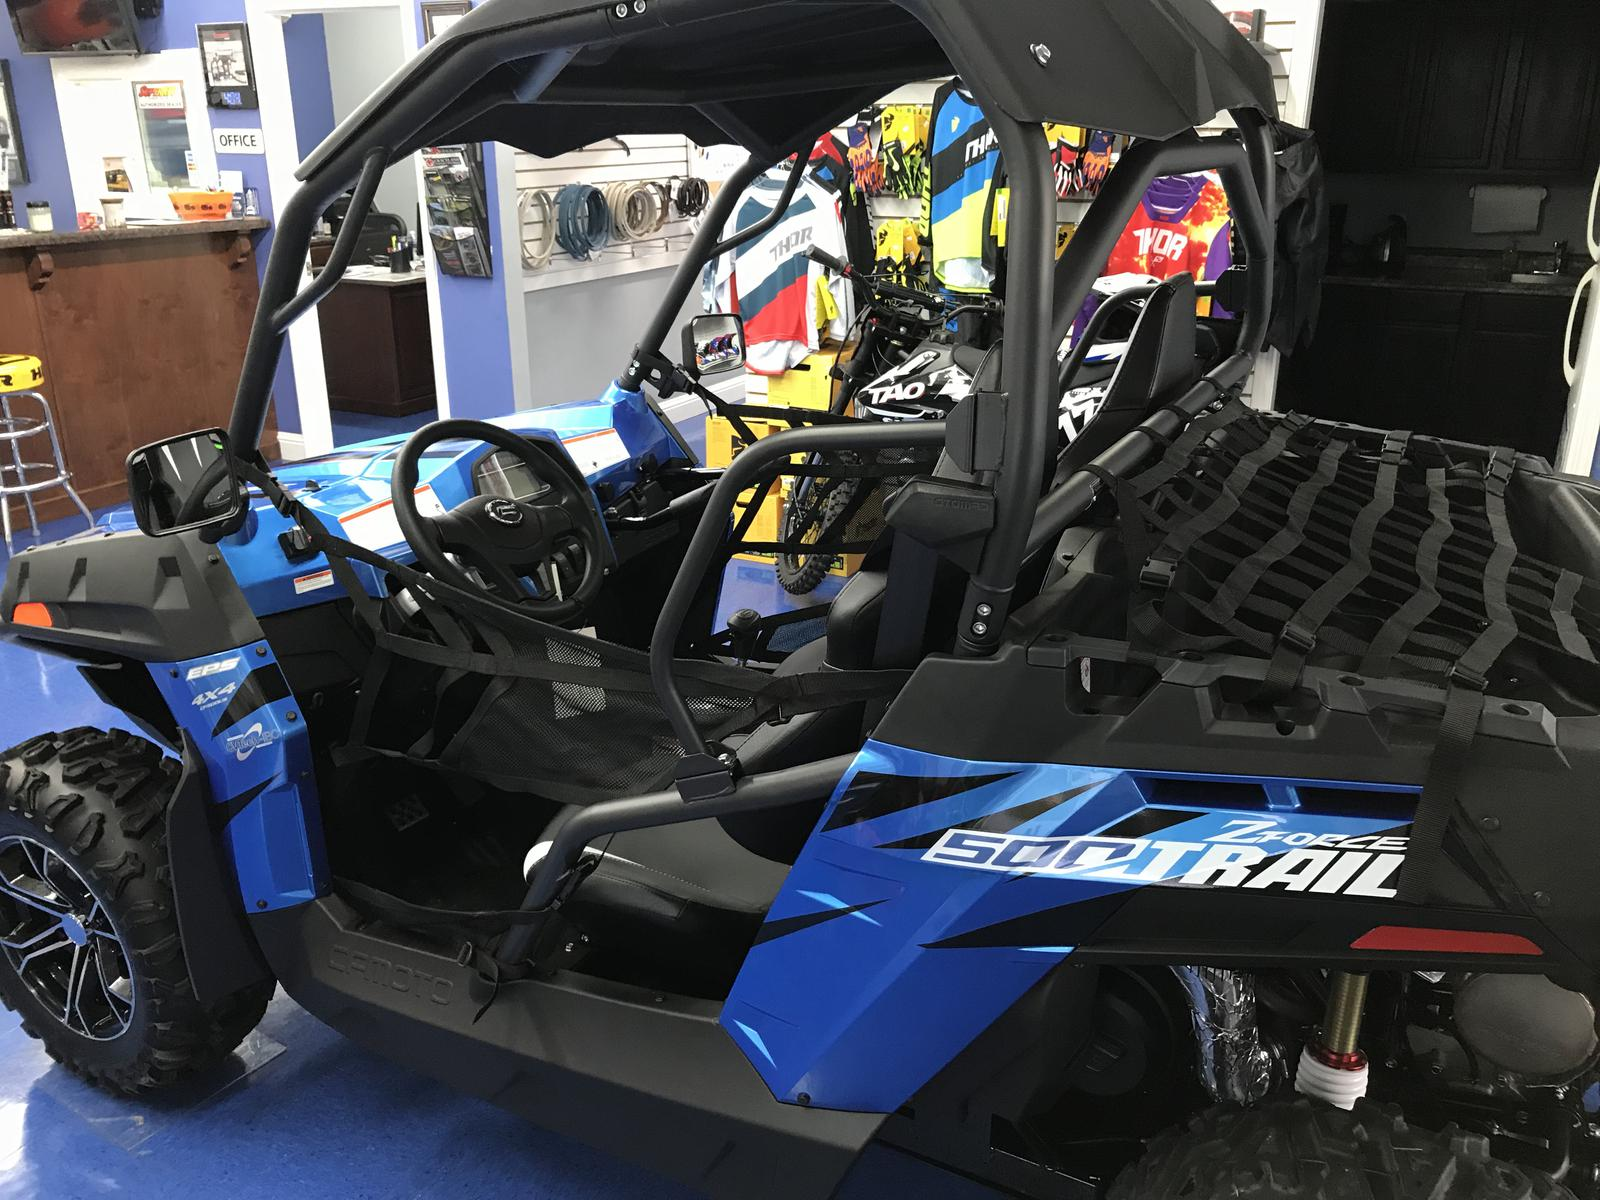 2018 CFMOTO ZFORCE 500 Trail 4X4 Sport SXS FREE WINDSHIELD